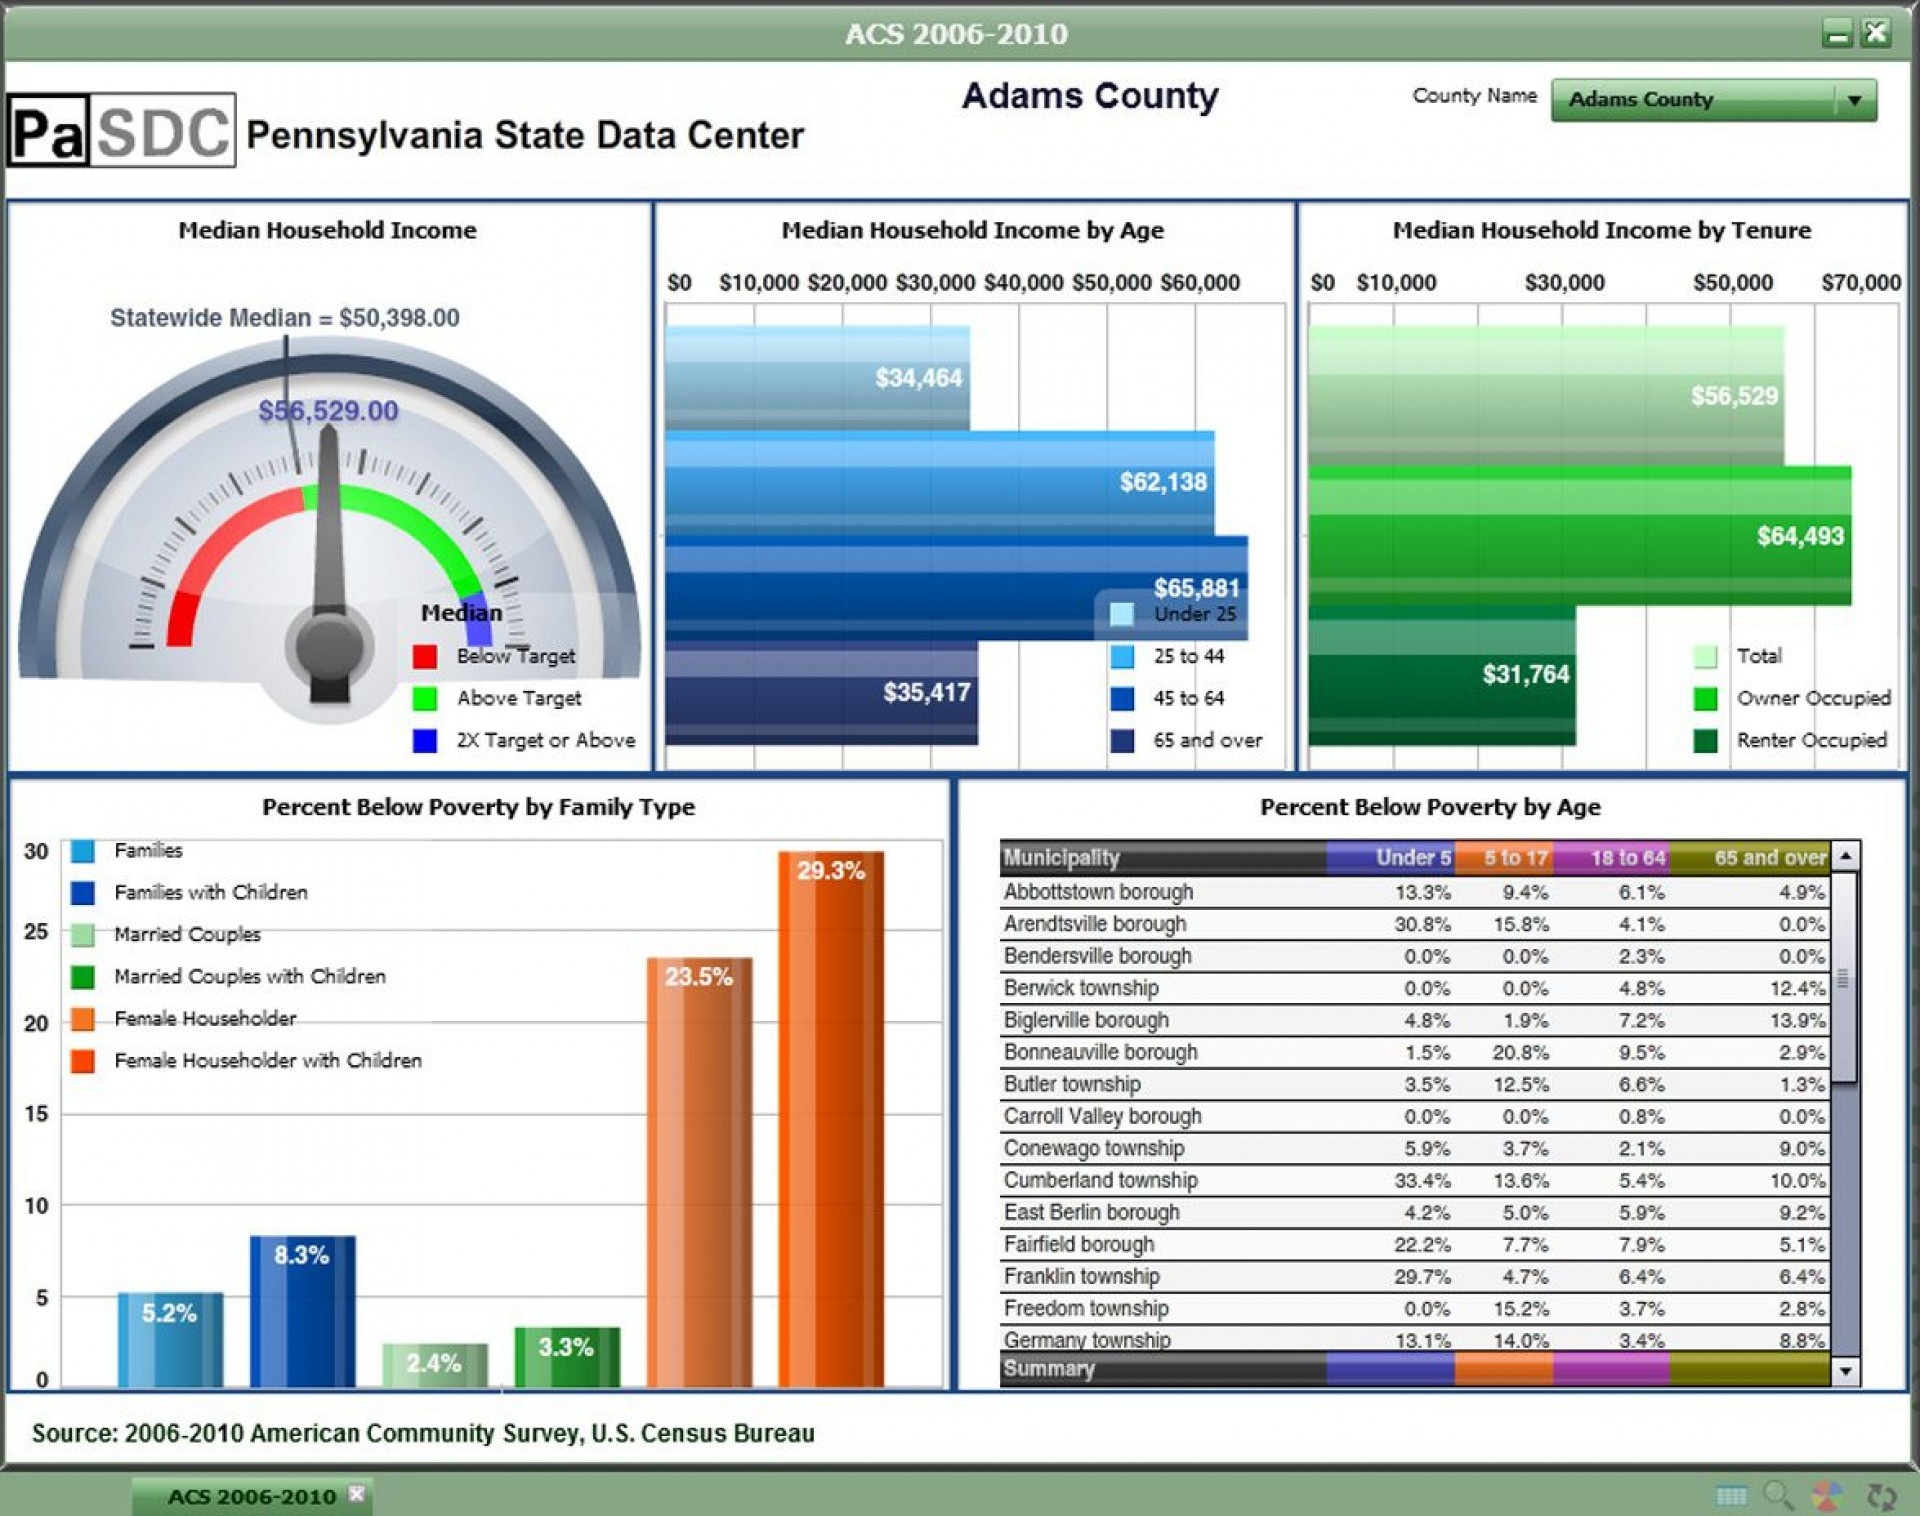 002 Frightening Excel Dashboard Template Free High Definition  Sale Logistic Kpi Download Procurement1920